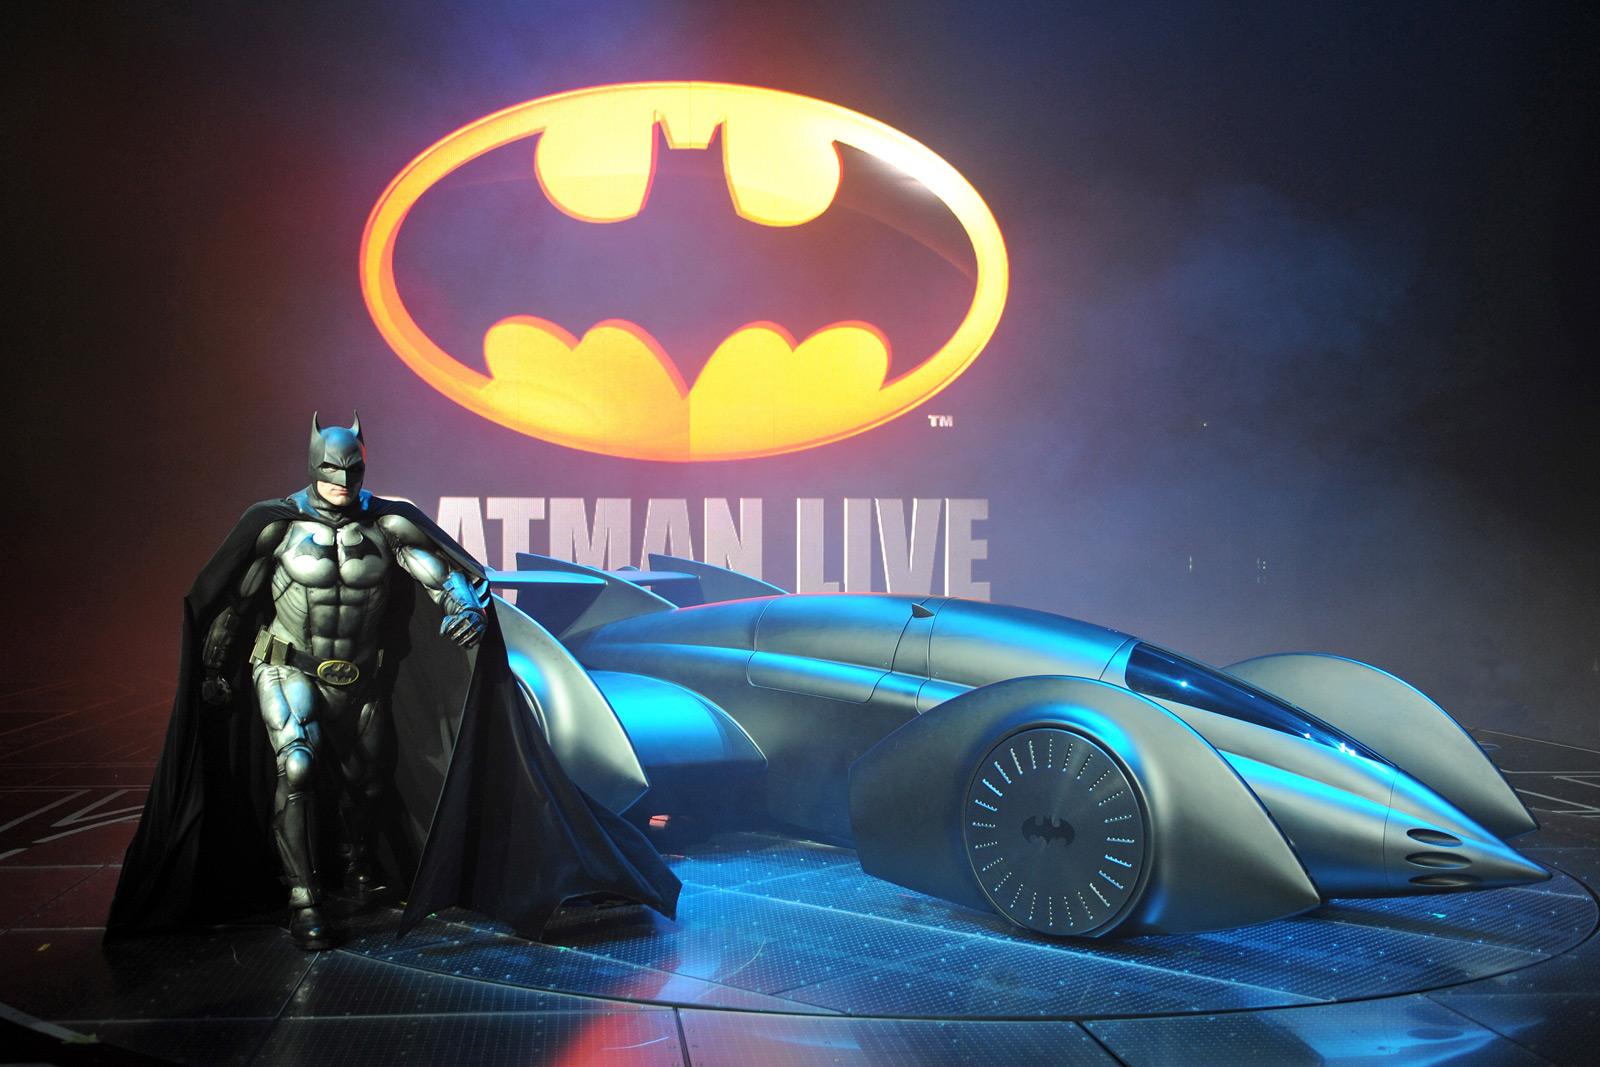 Gordon Murray's Formula One-style Batmobile